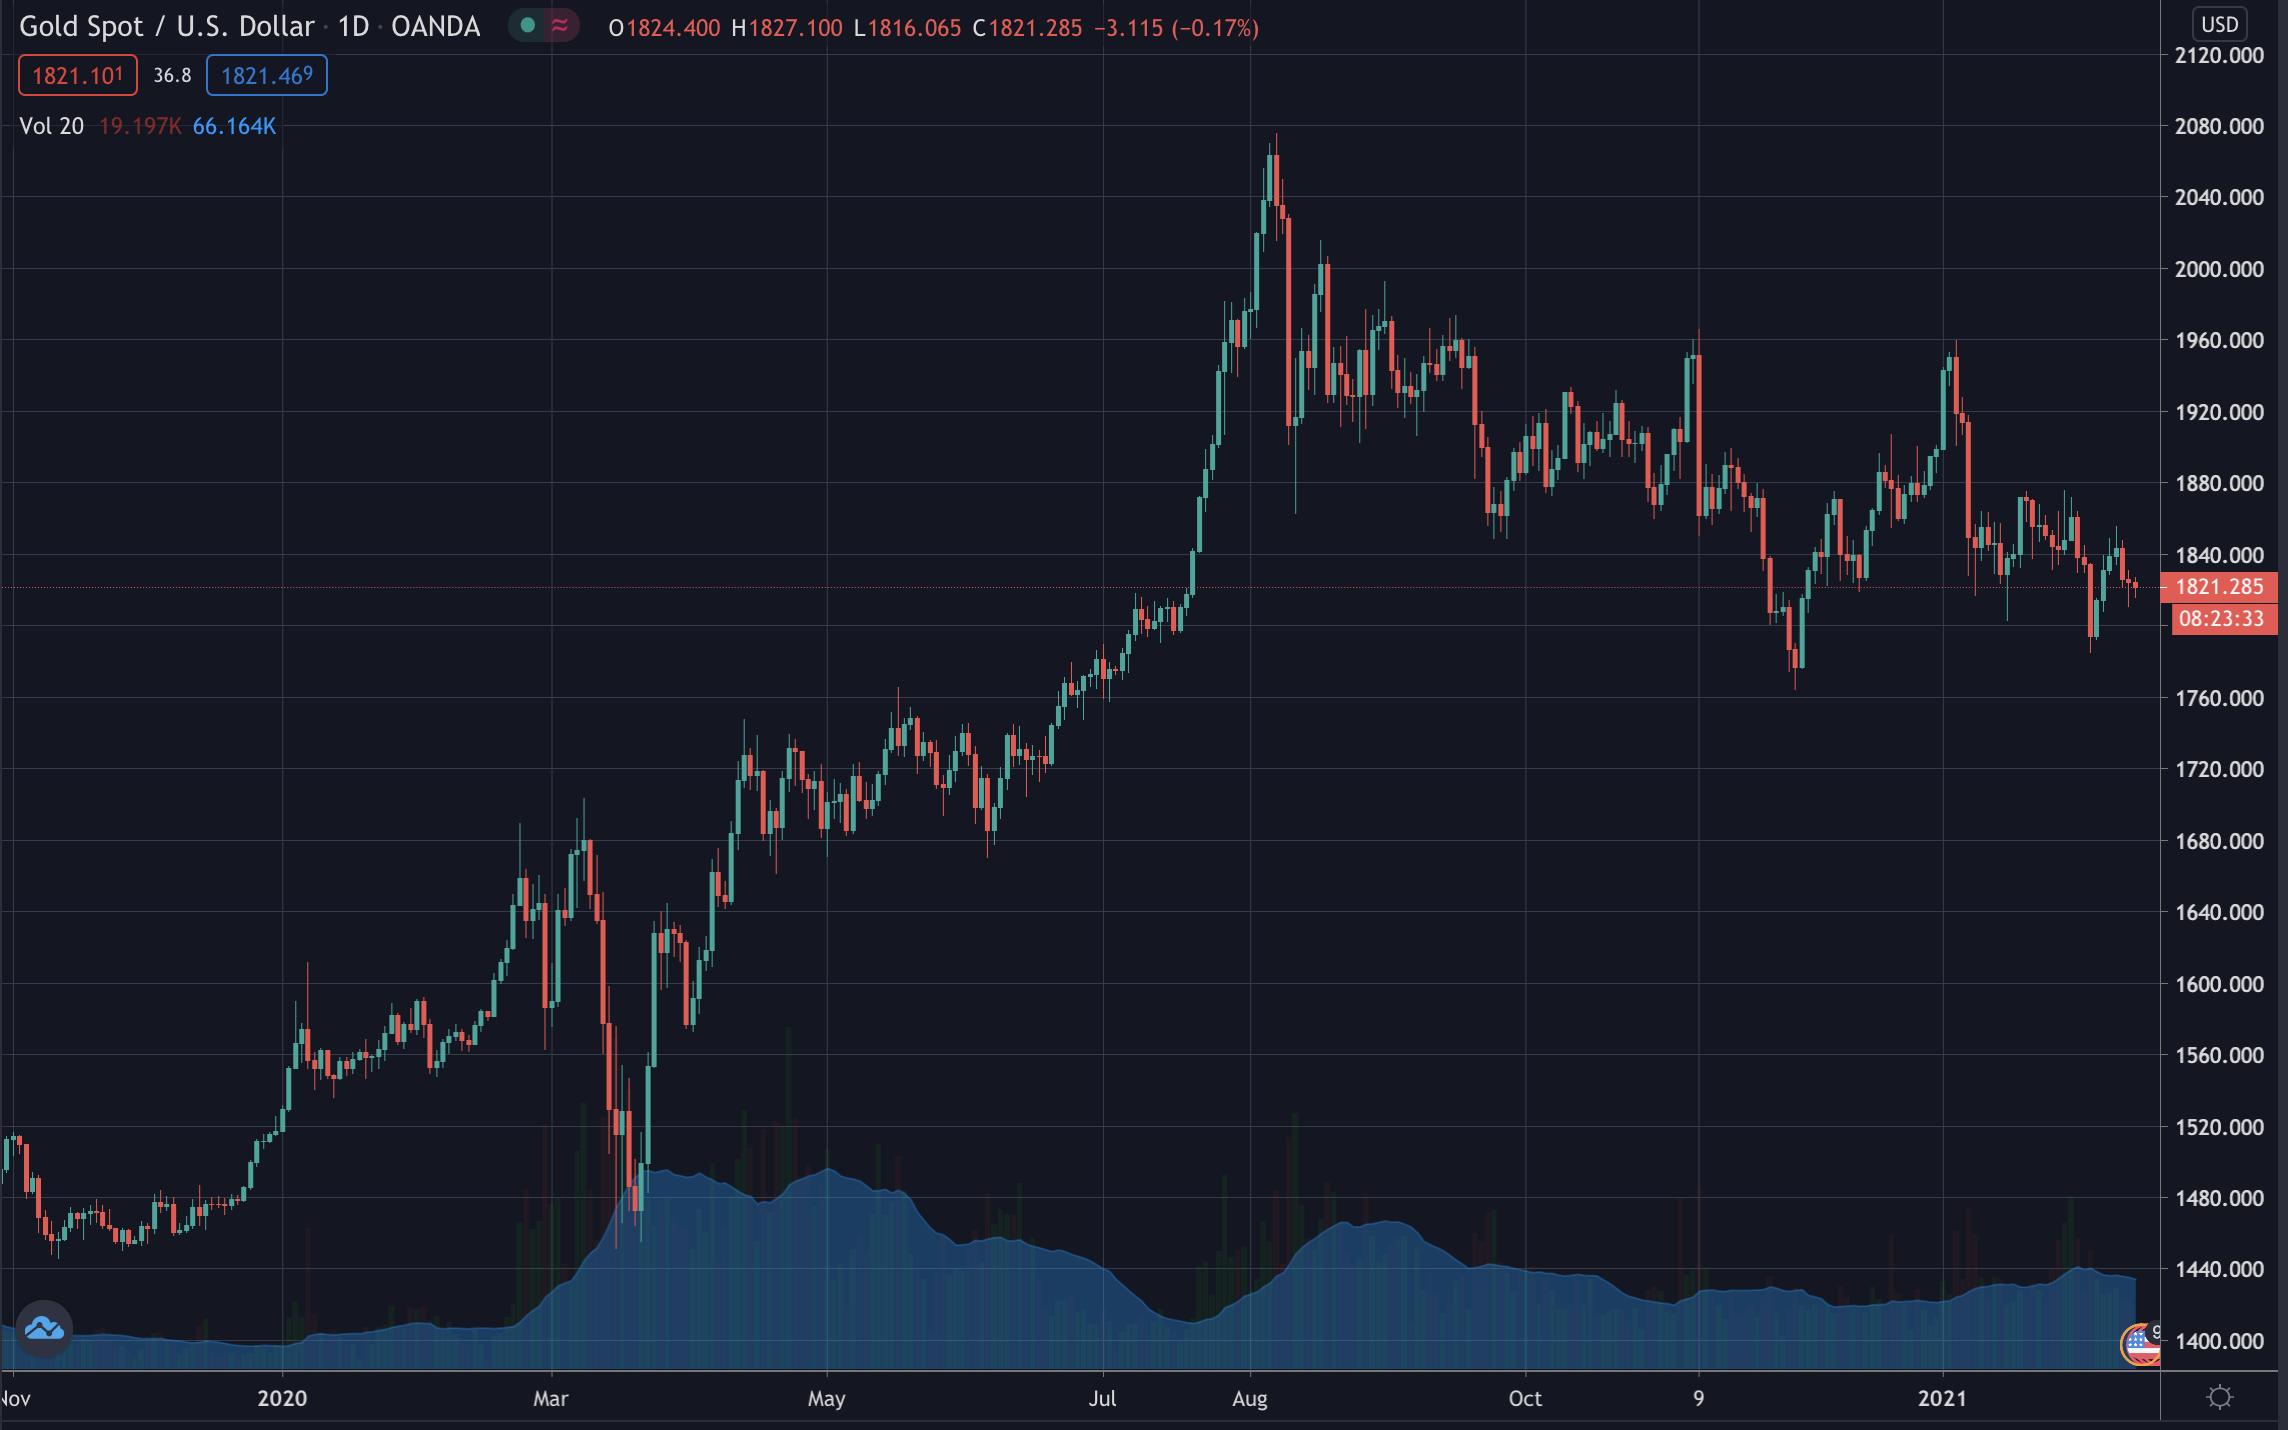 Gold's price, Feb 2021